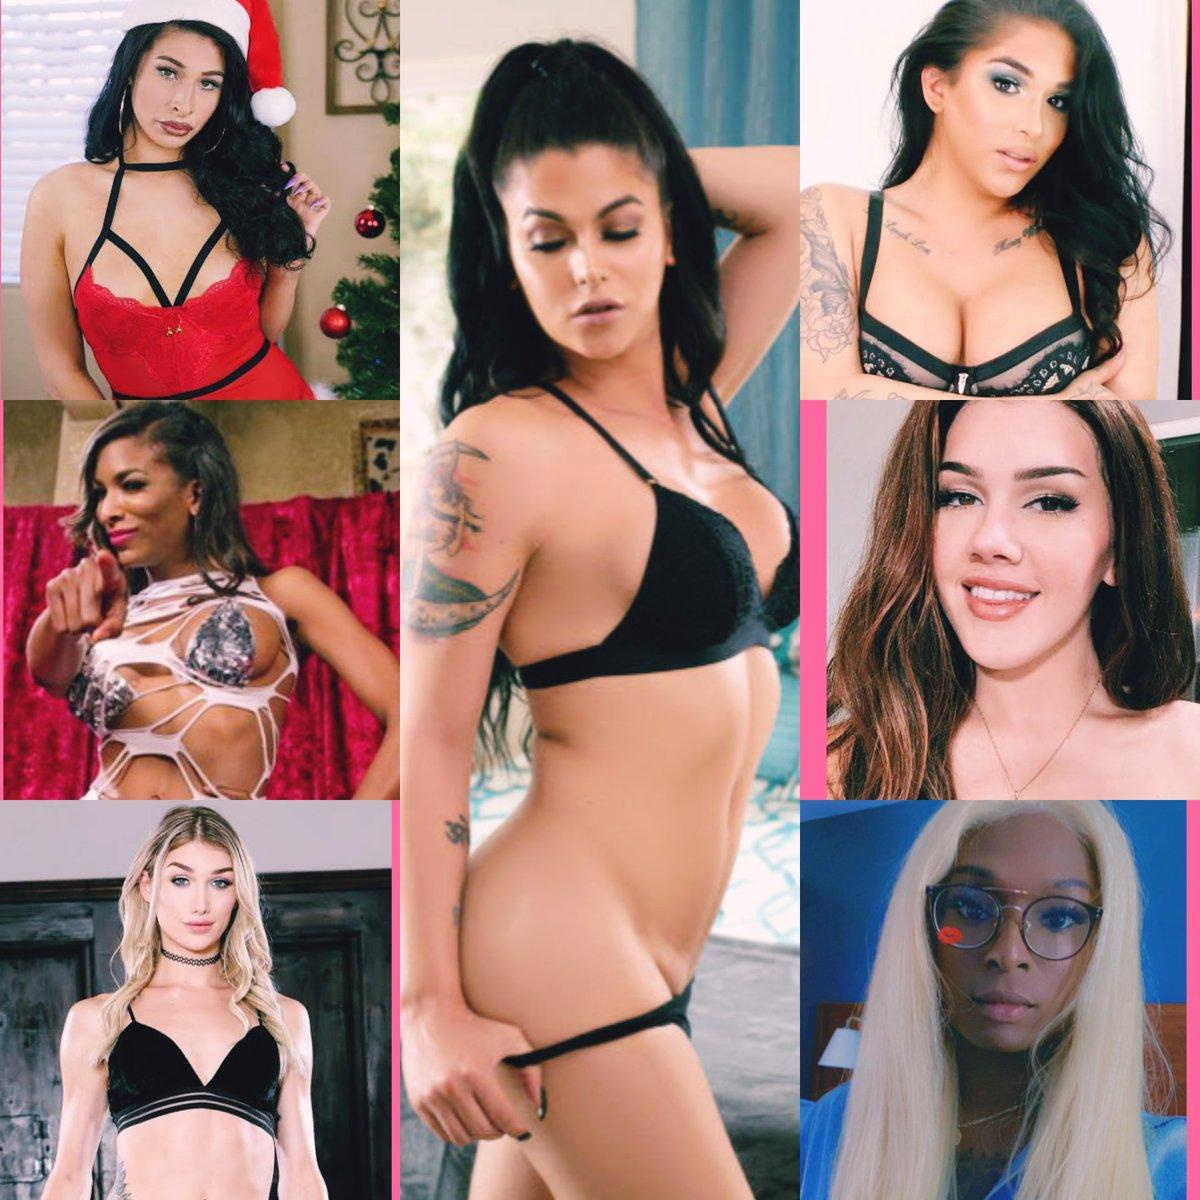 Hi i made this collage pic i hope you like it @TsJamieXxX @NATASSIADREAMSX @LunaLoveXXX @Alexascout @janemarie_xo @HereOnNeptune @DominoPresley For bookings:dominopresley@Gmail.com